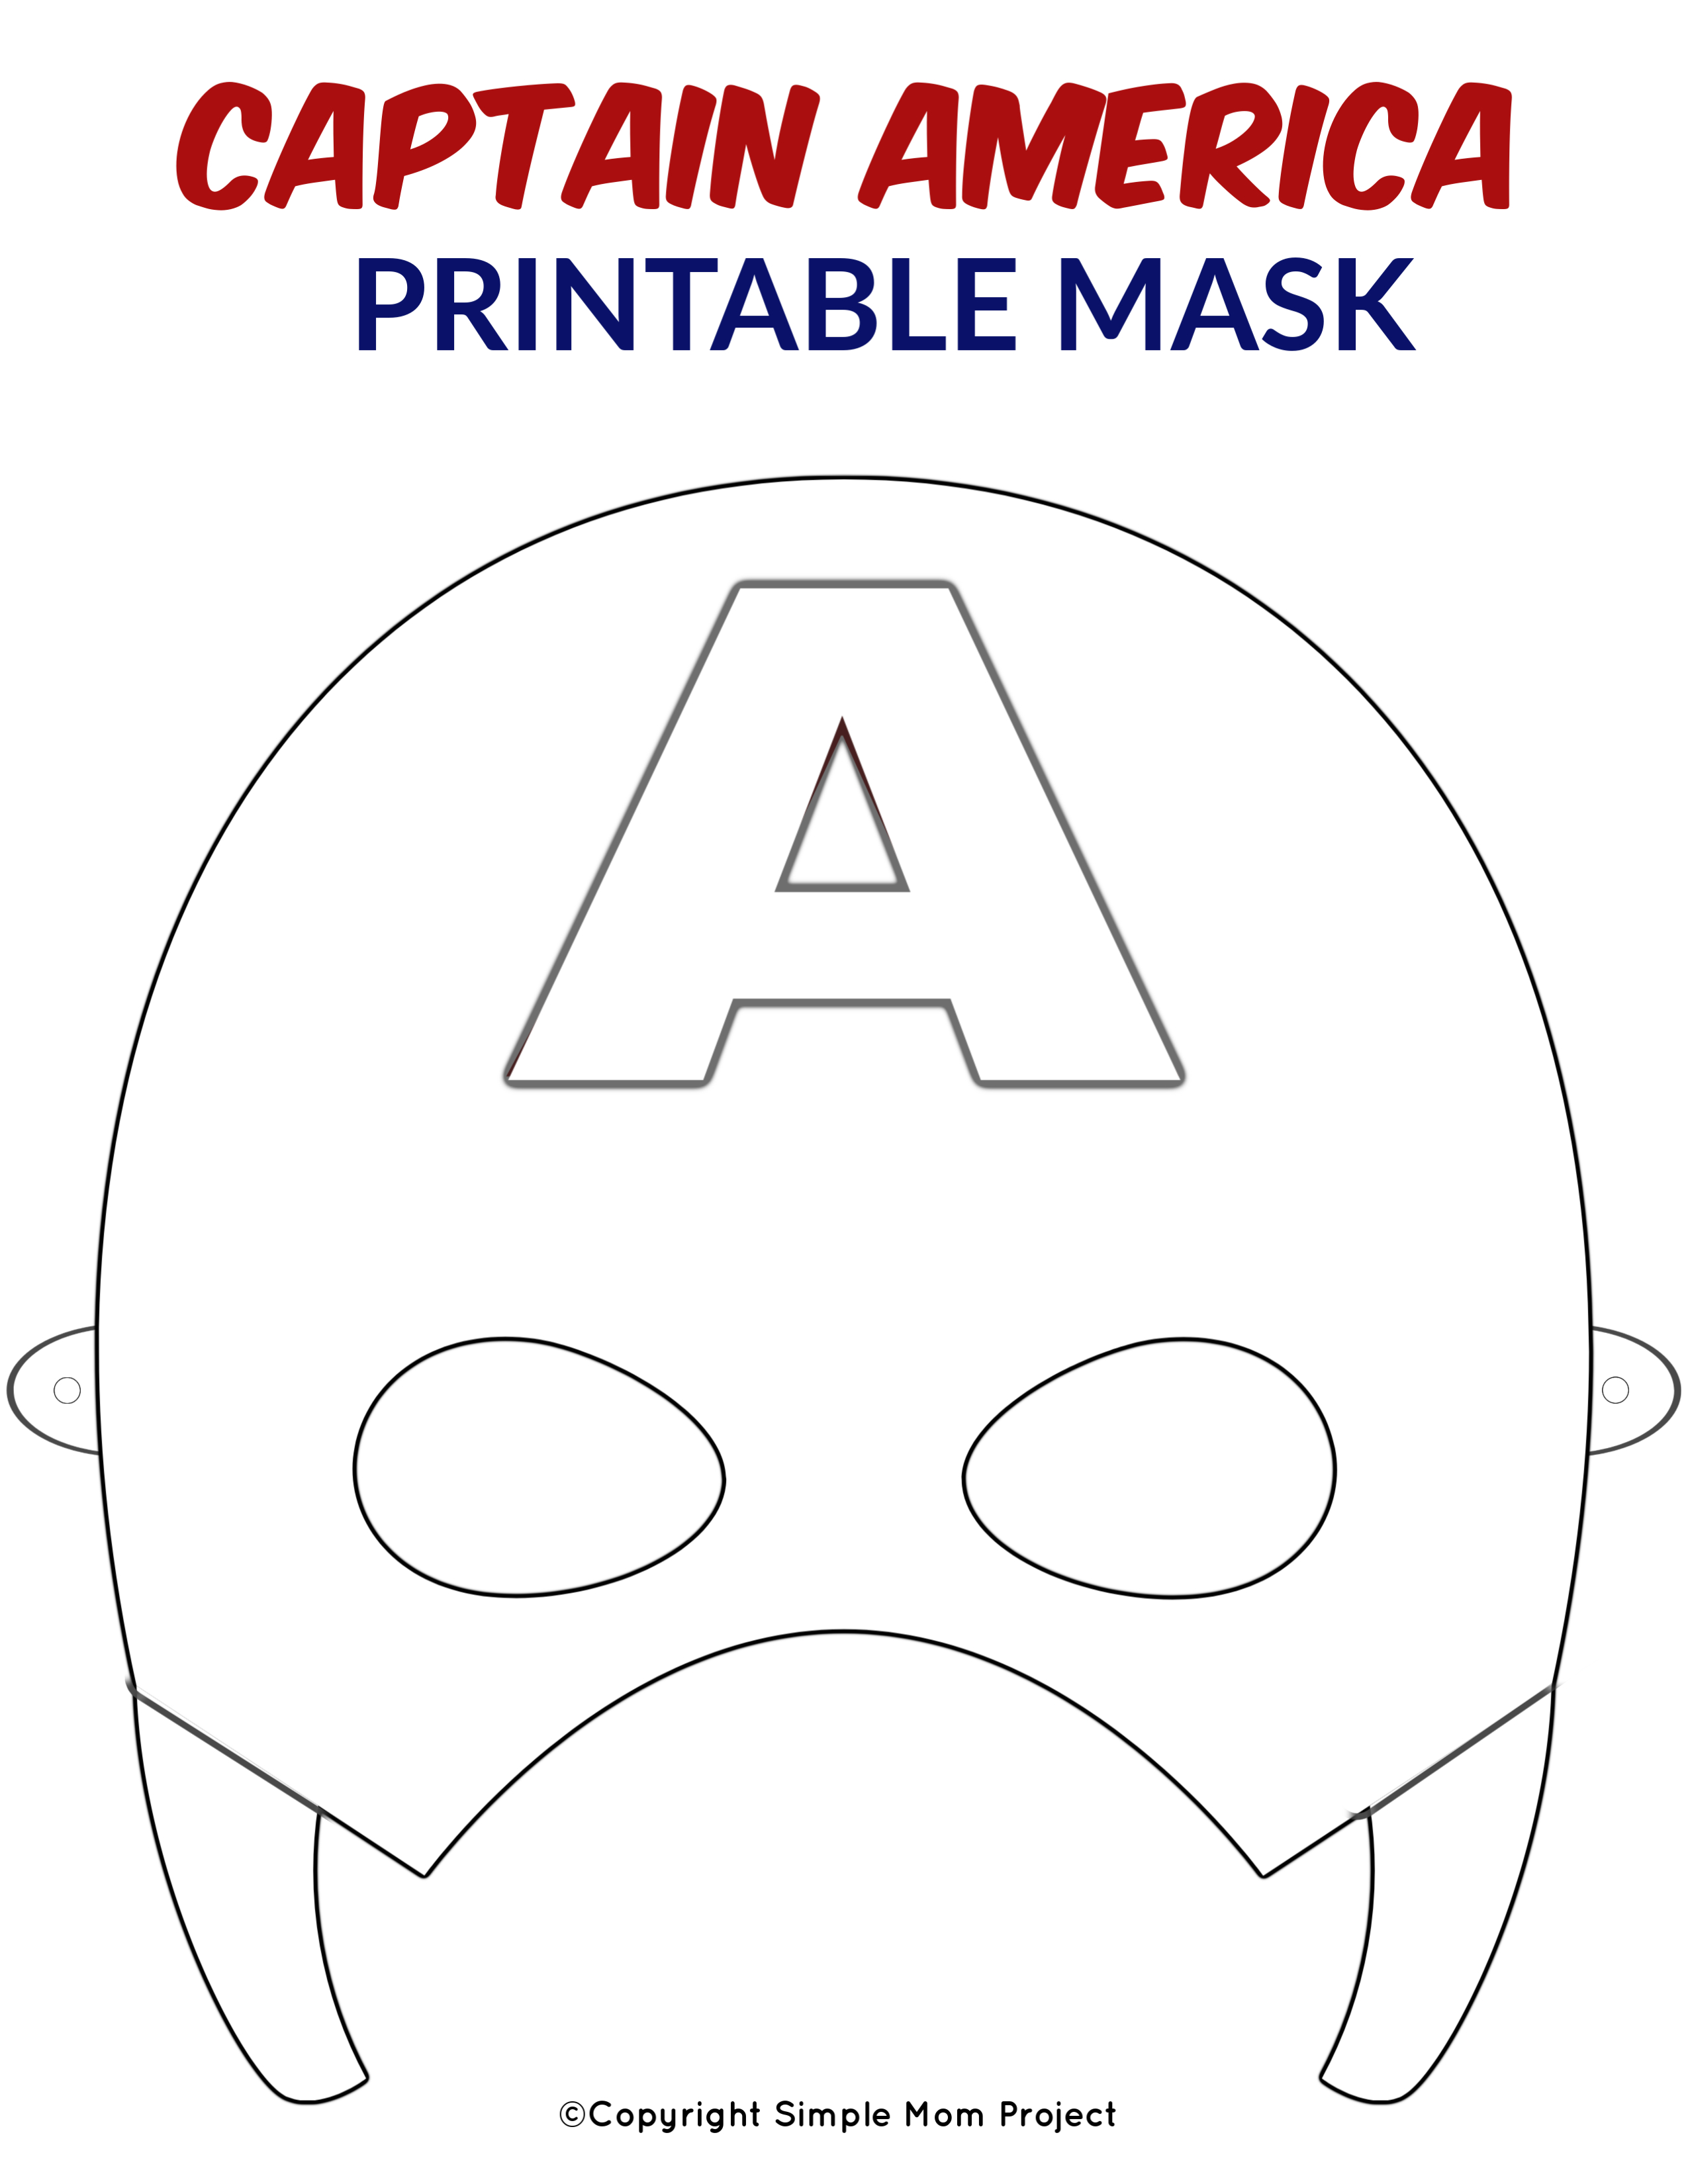 Free Printable Superhero Face Masks For Kids - Simple Mom Project - Free Printable Face Masks